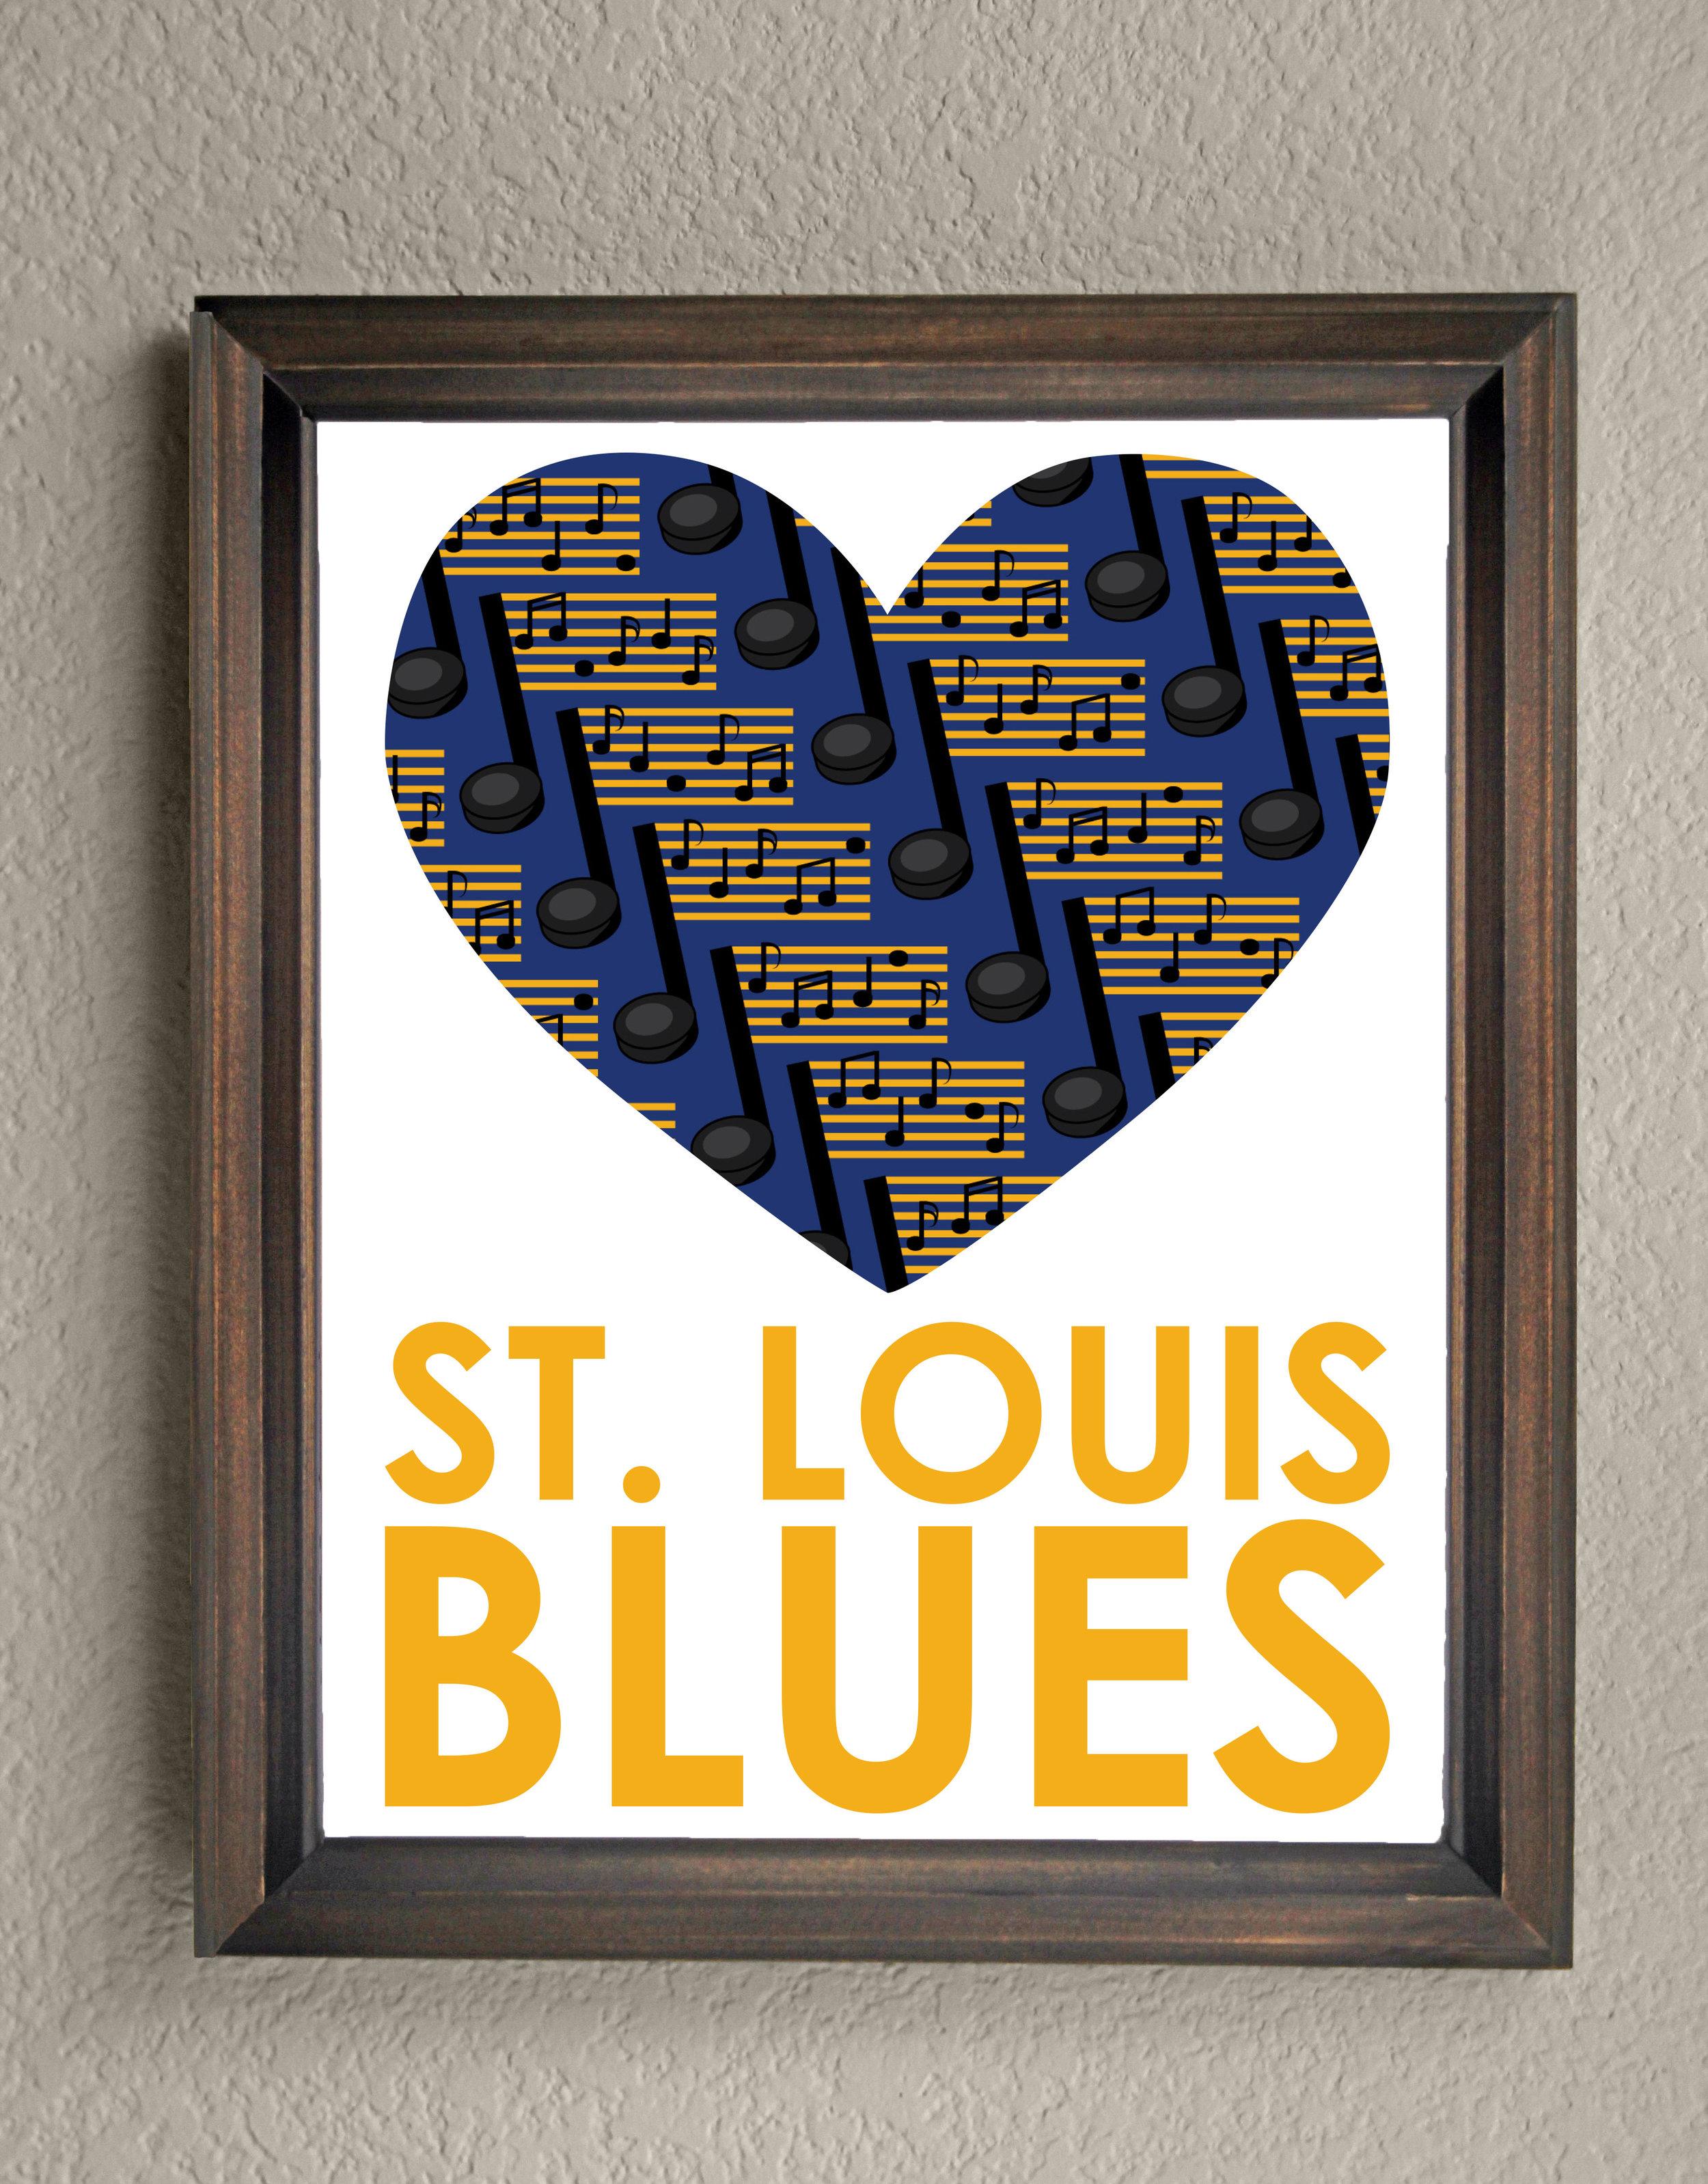 stl_blues_3